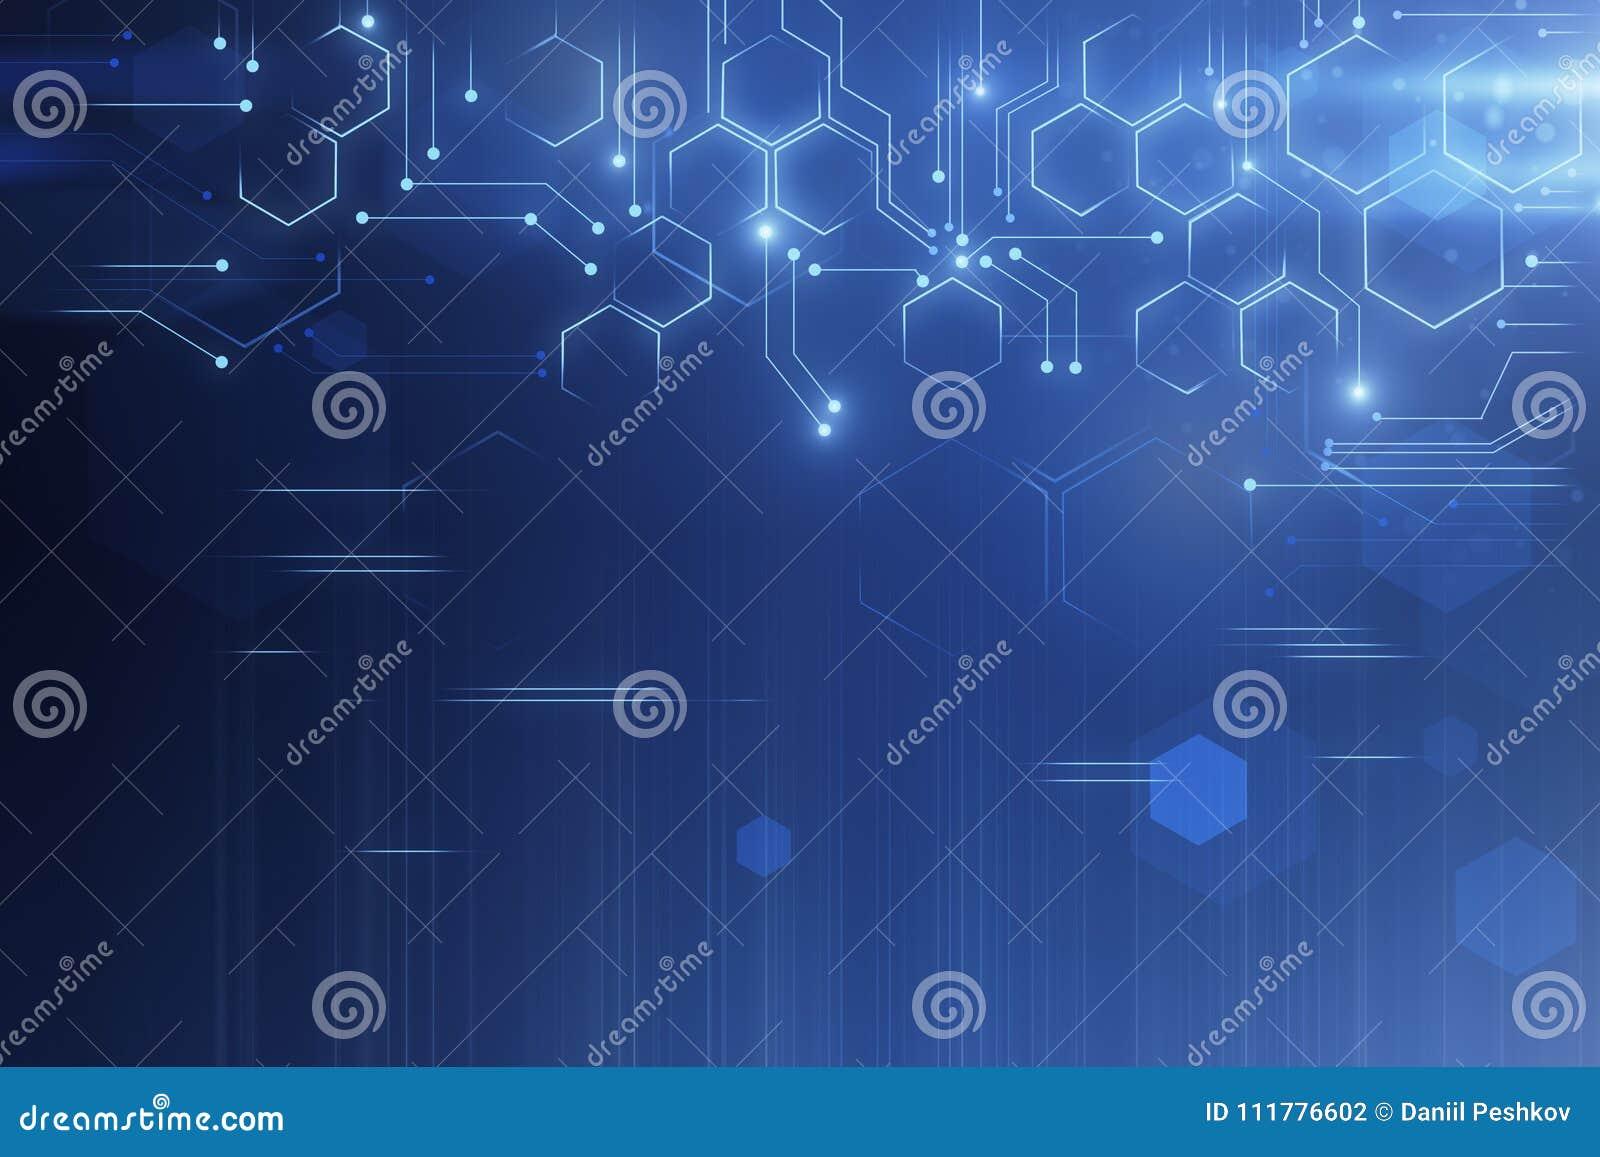 Creative tech background